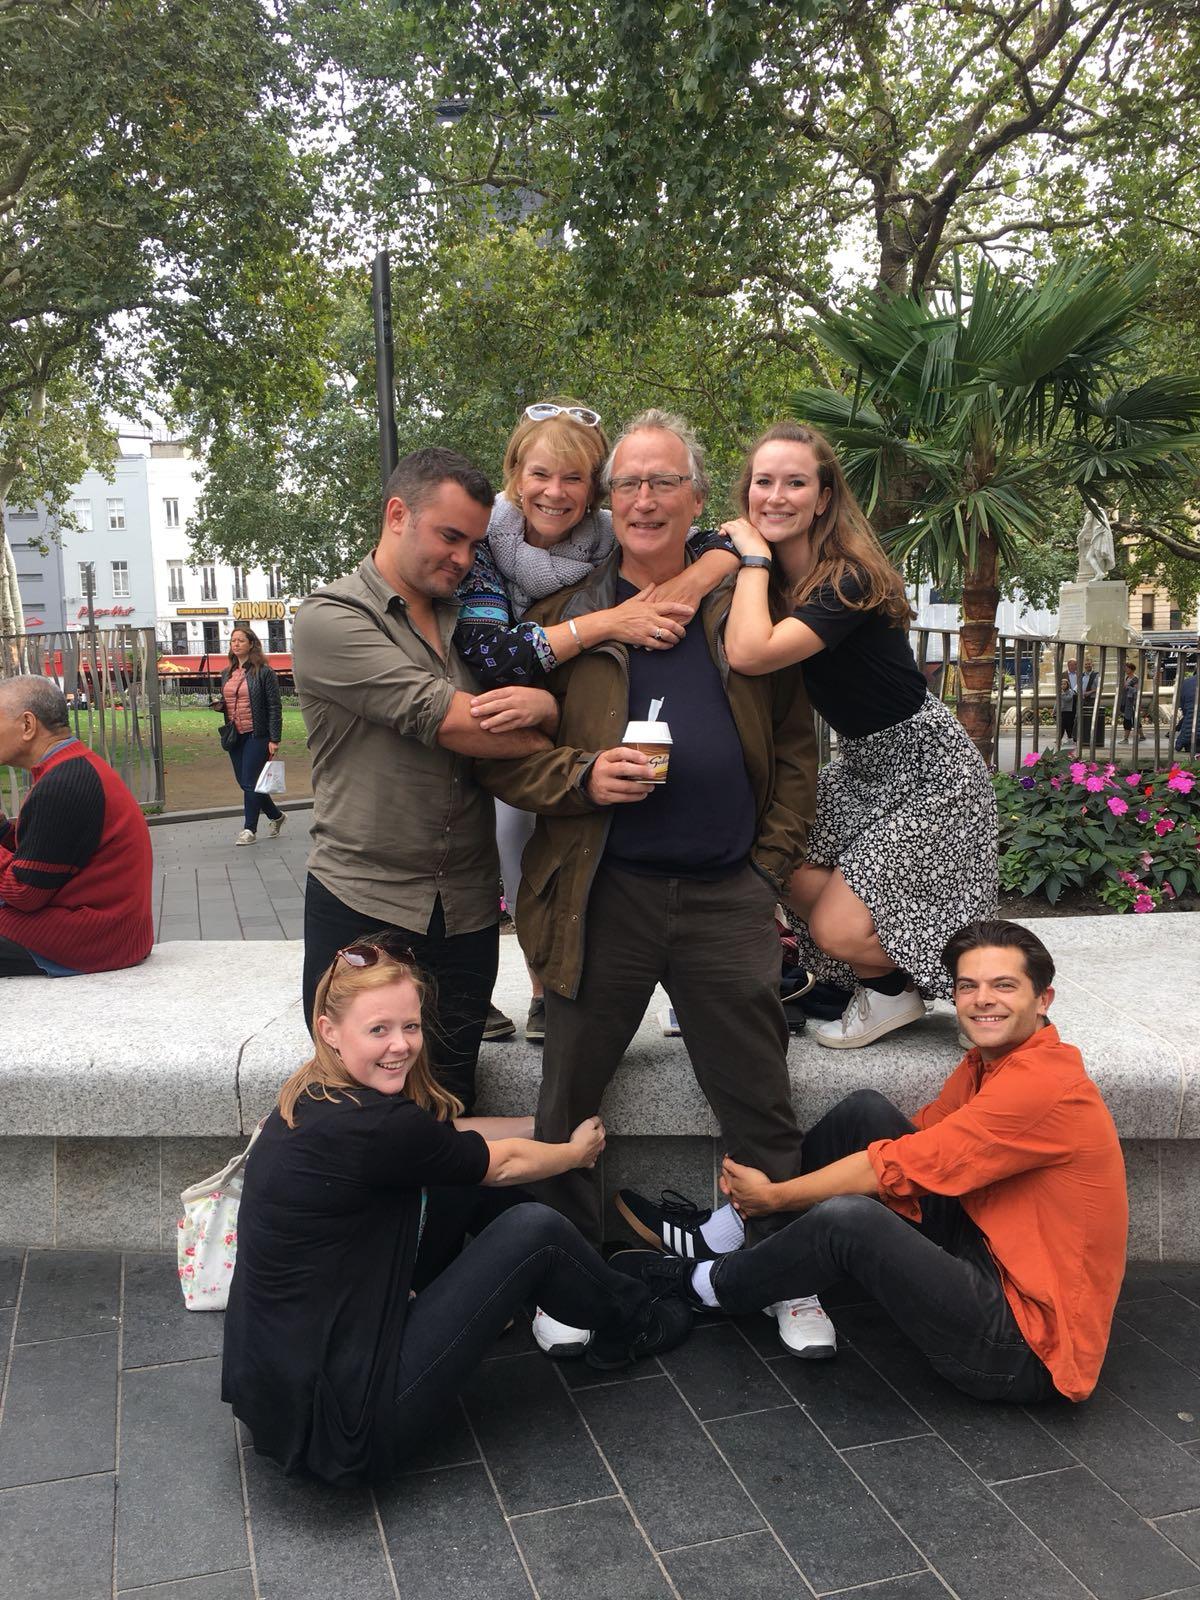 Awkward family photo challenge at a 50th celebration